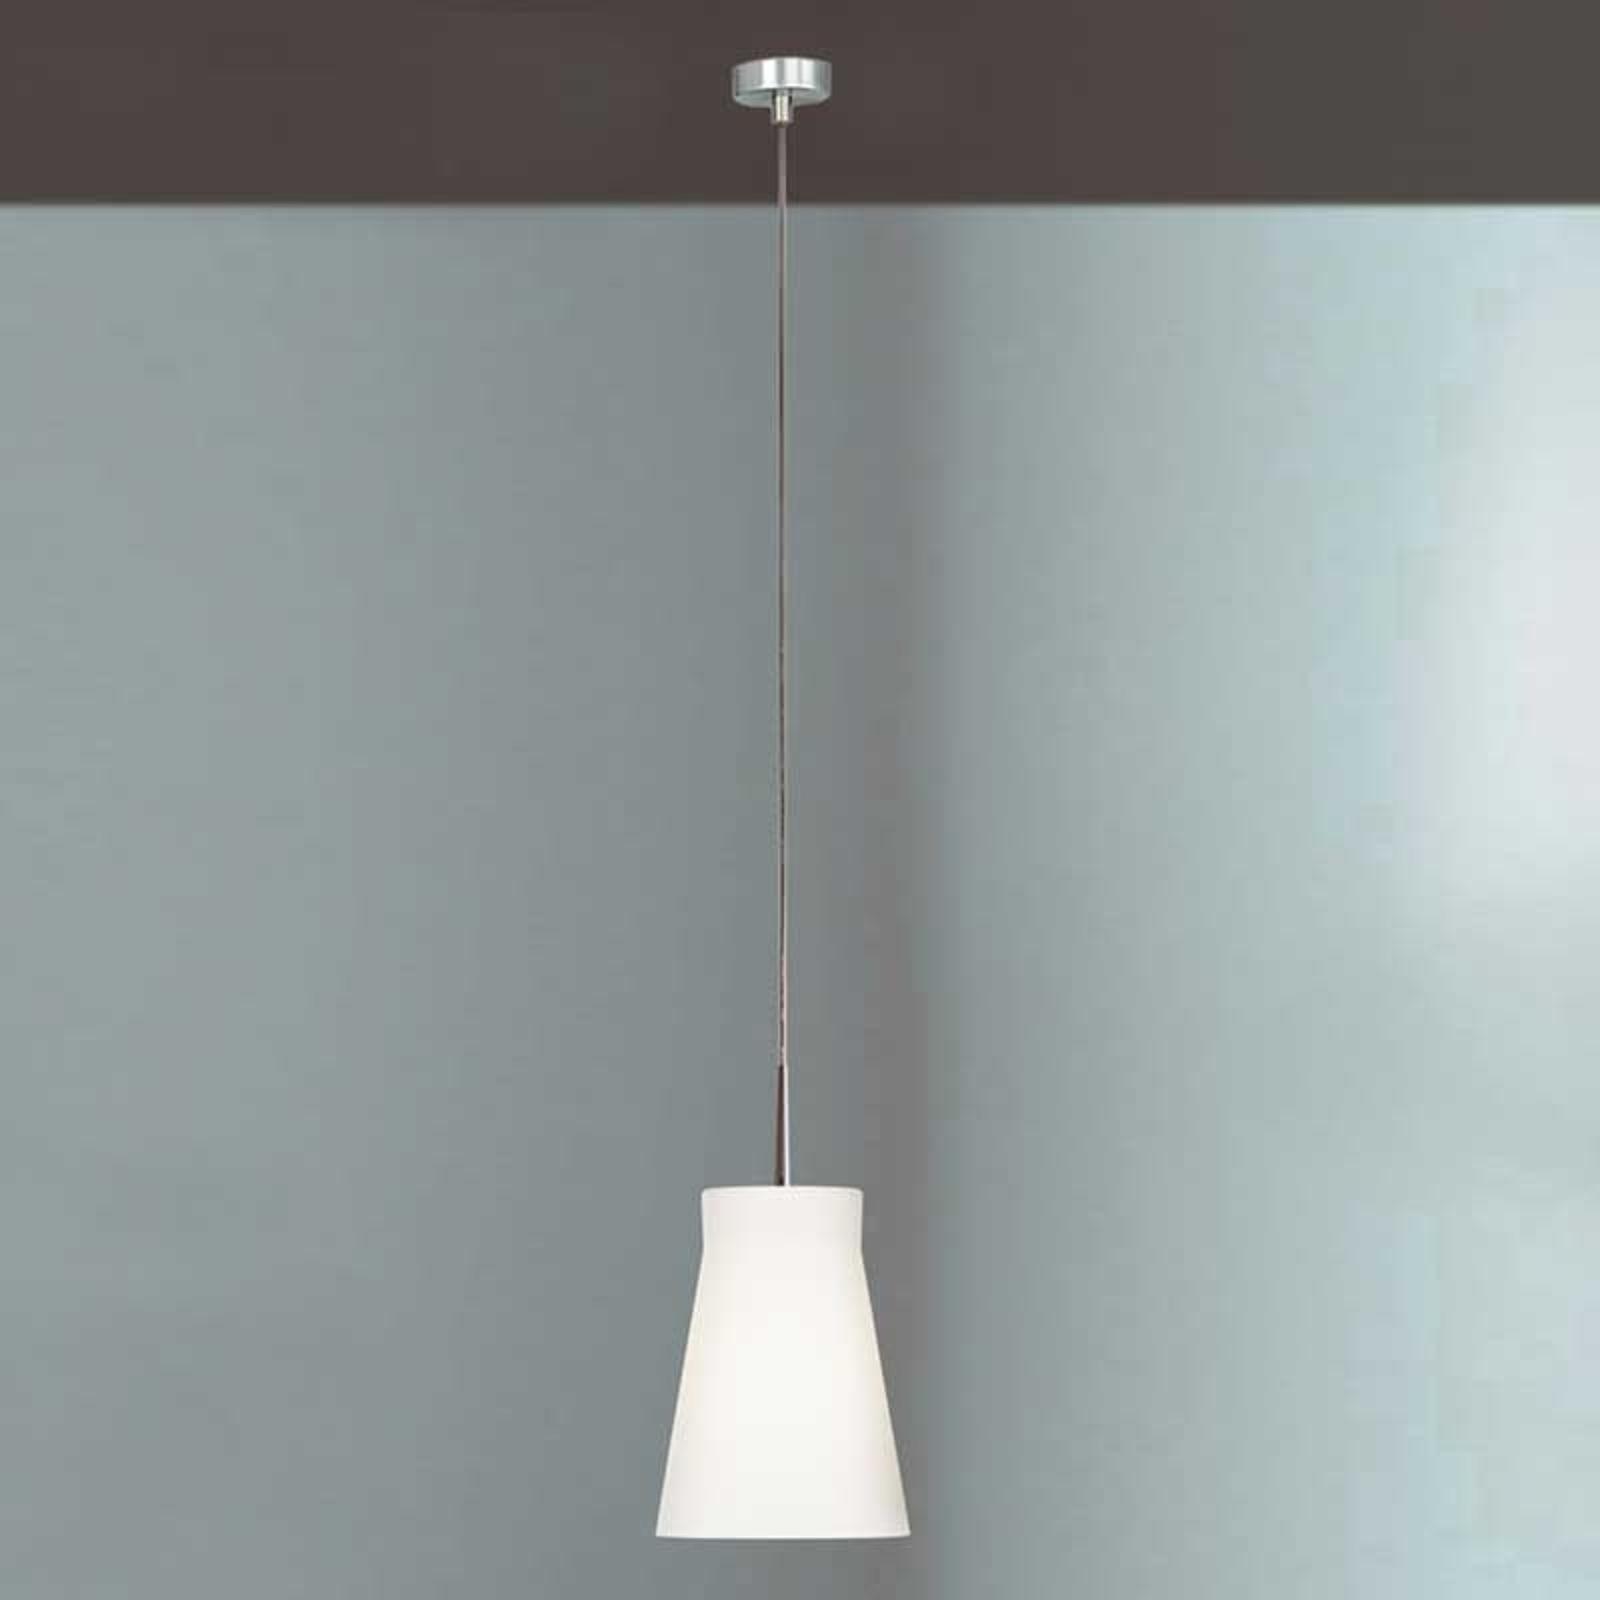 Lampada a sospensione MOMO 1 lampadina